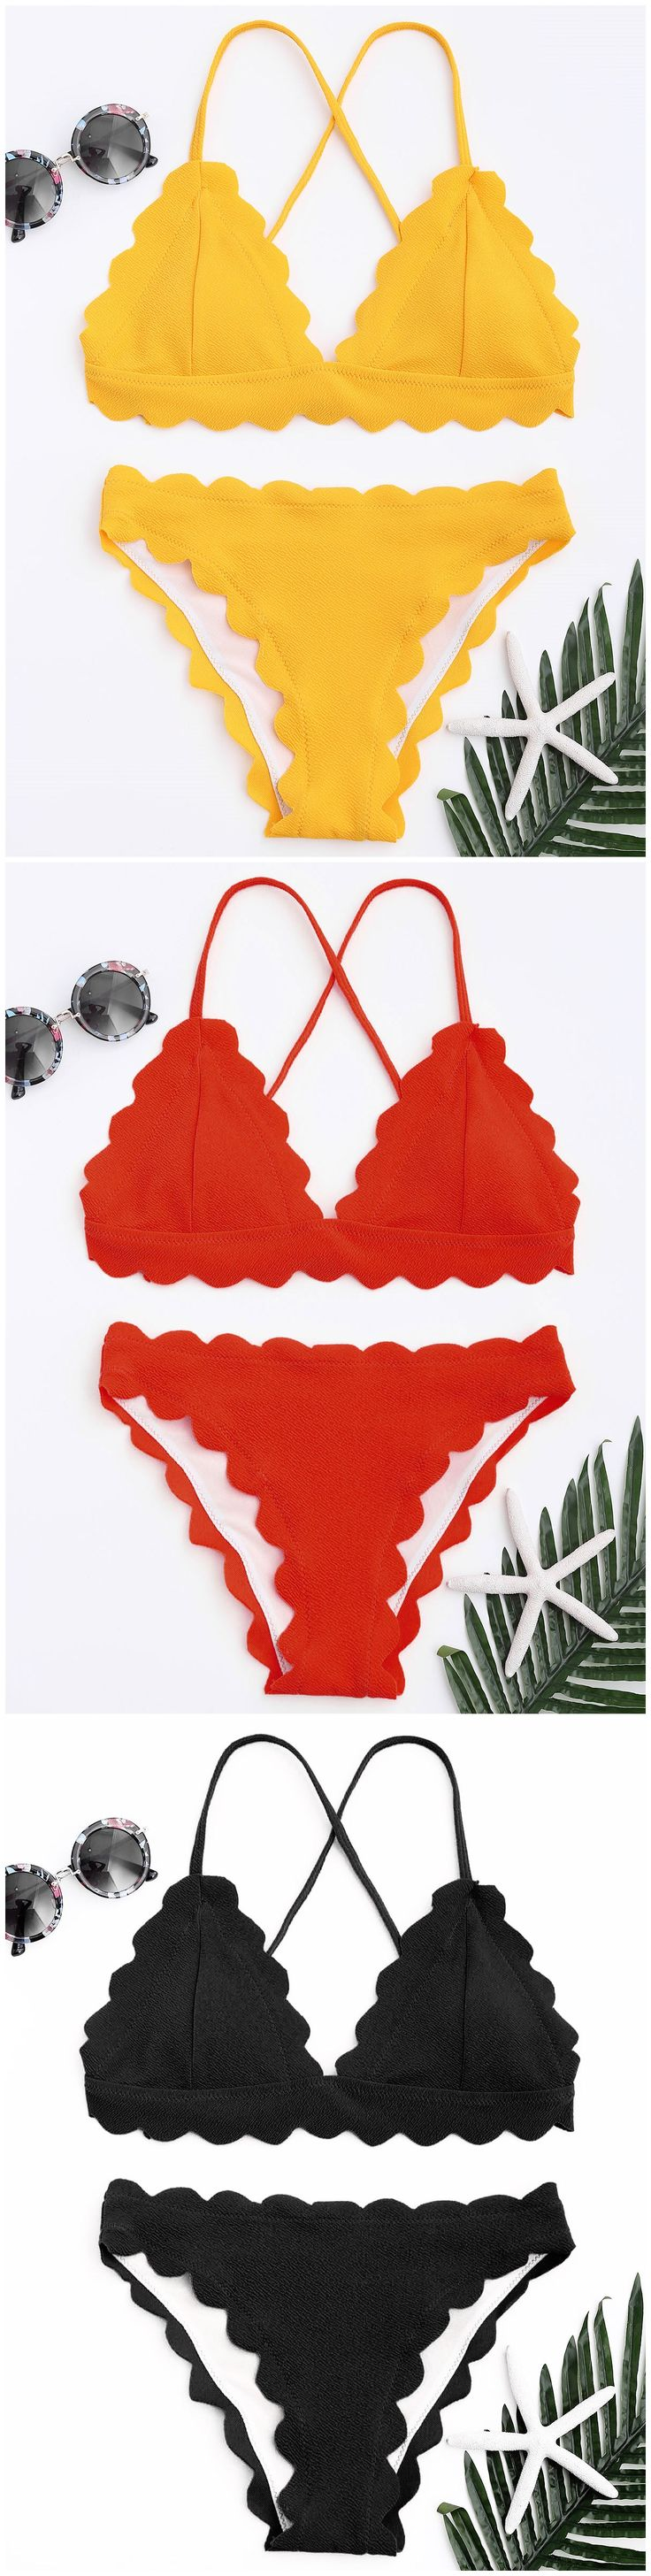 Up to 80% OFF! Scalloped Bikini Set. #Zaful #Swimwear #Bikinis zaful,zaful outfits,zaful dresses,spring outfits,summer dresses,Valentine's Day,valentines day ideas,cute,casual,fashion,style,bathing suit,swimsuits,one pieces,swimwear,bikini set,bikini,one piece swimwear,beach outfit,swimwear cover ups,high waisted swimsuit,tankini,high cut one piece swimsuit,high waisted swimsuit,swimwear modest,swimsuit modest,cover ups,swimsuit cover up @zafulbikini Extra 10% OFF Code:zafulbikini